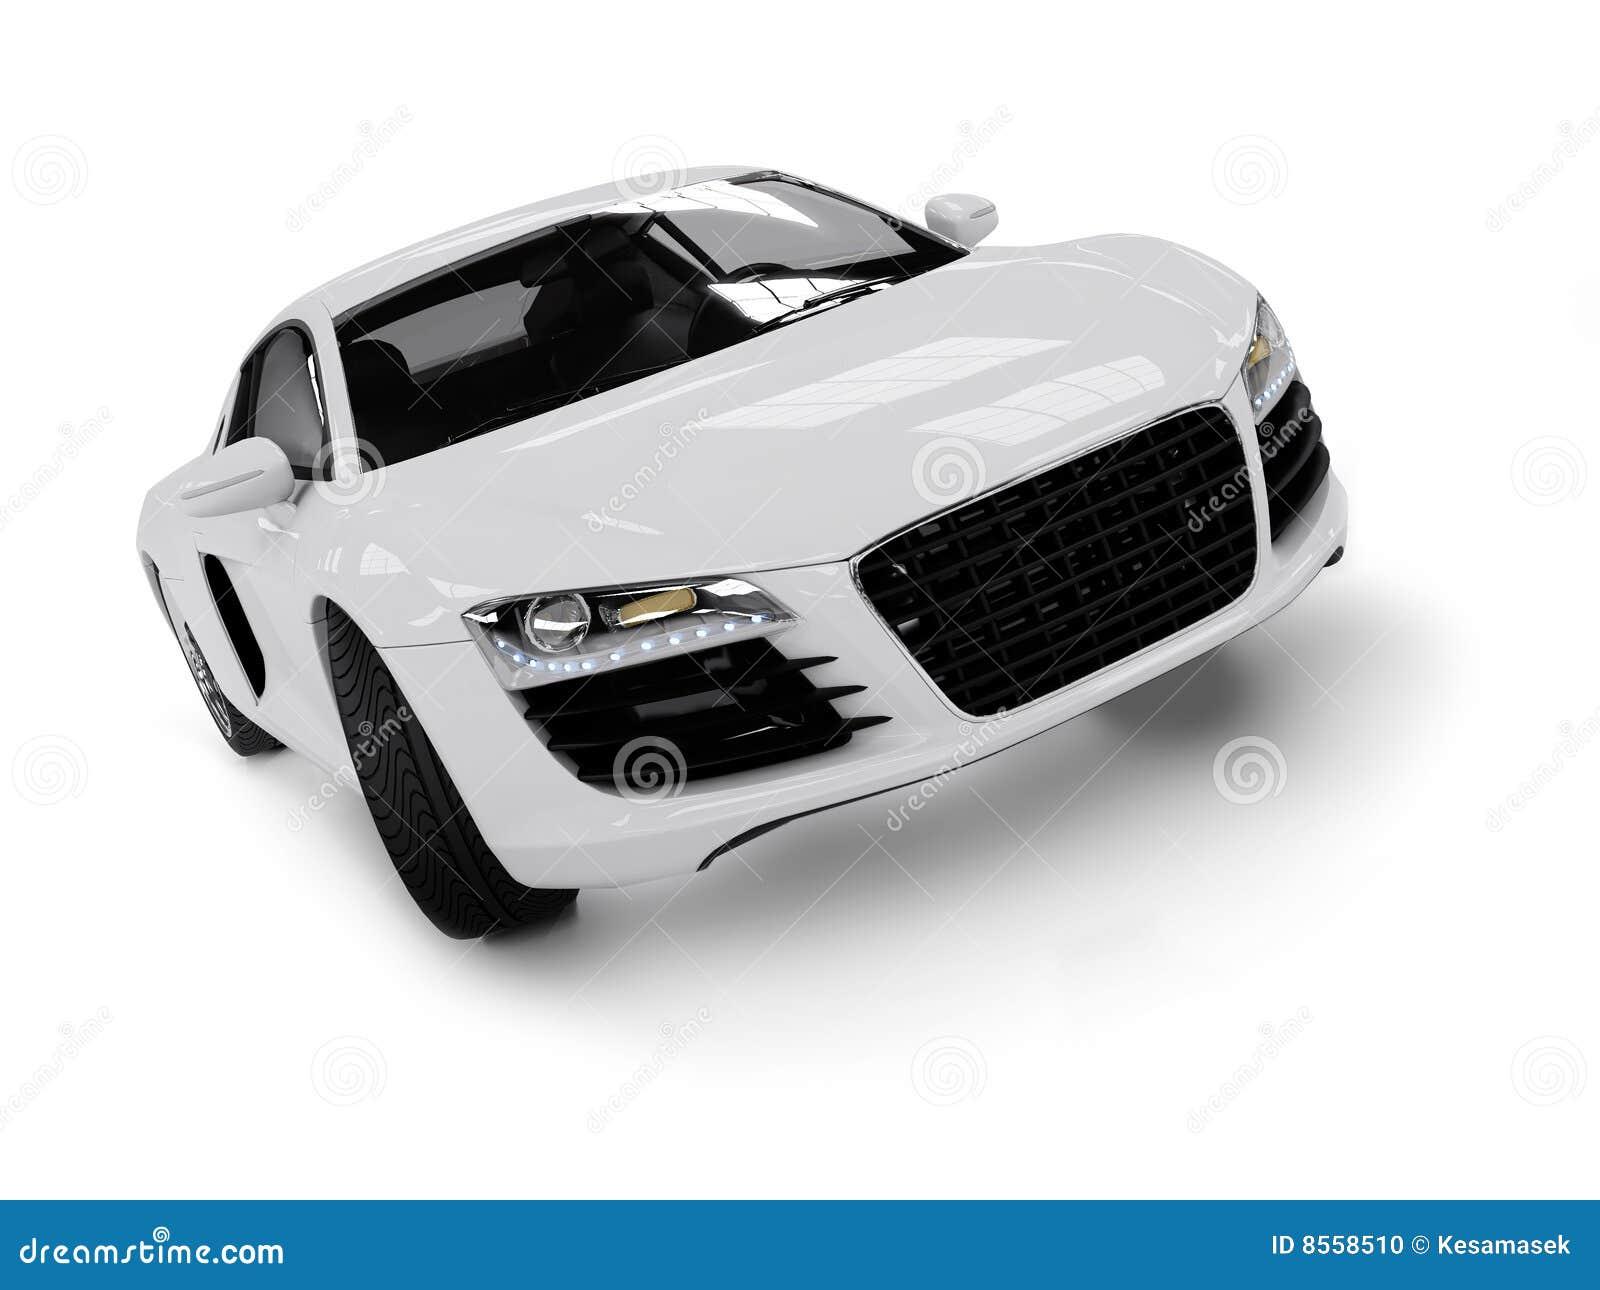 foto carro moderno: